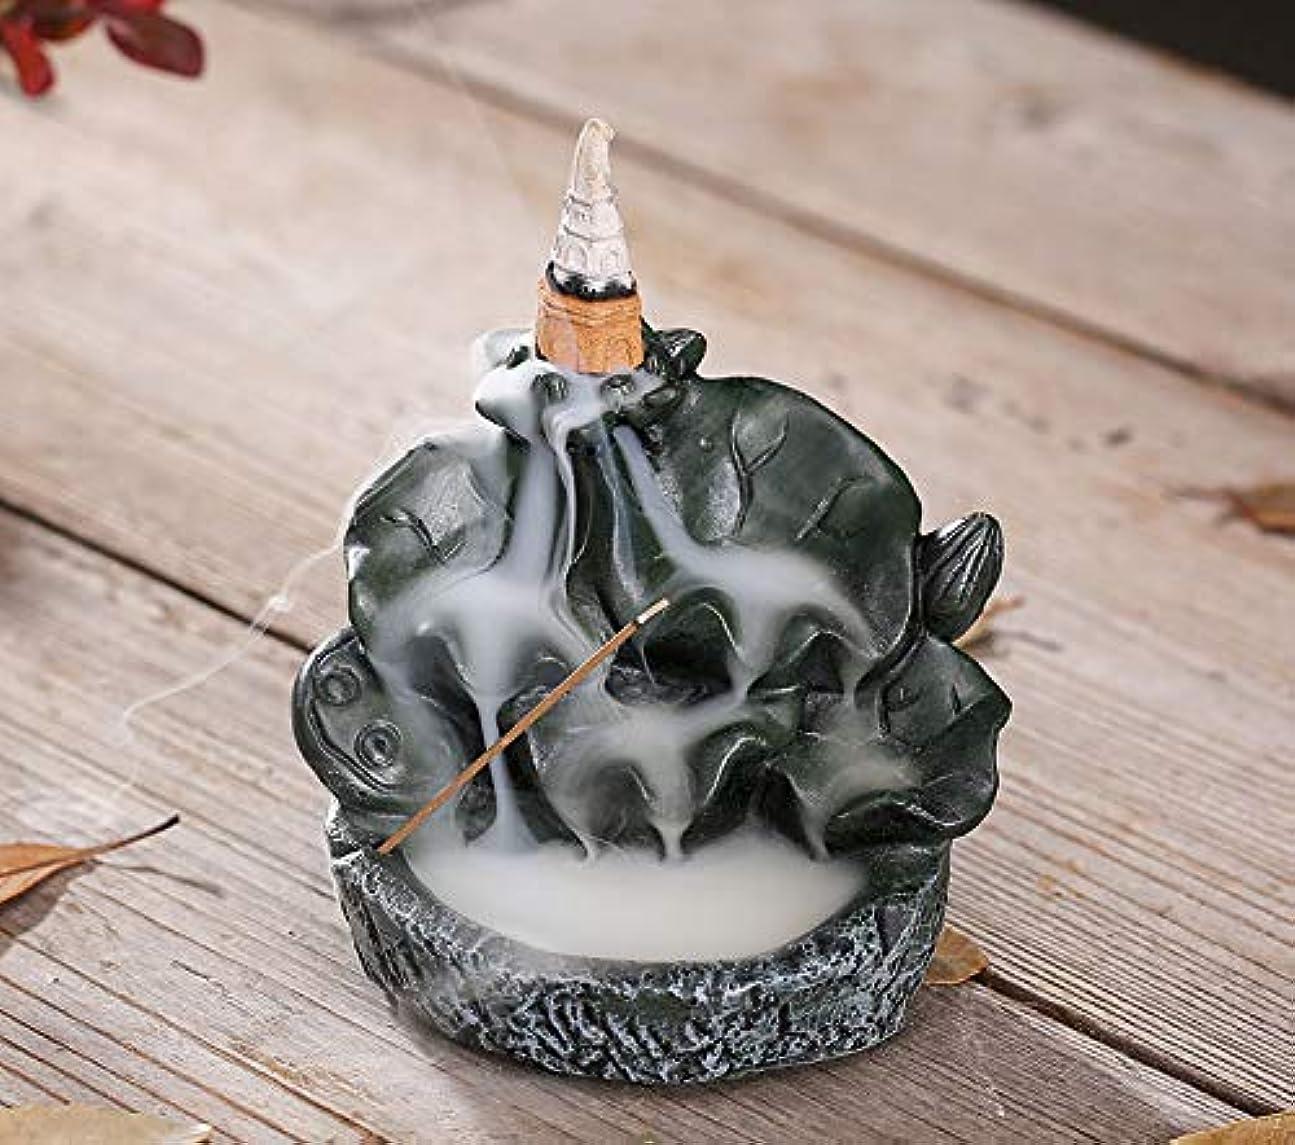 PHILOGOD香炉ロータススタイリング陶器逆流香炉線香香立て仏壇用香置物/香皿